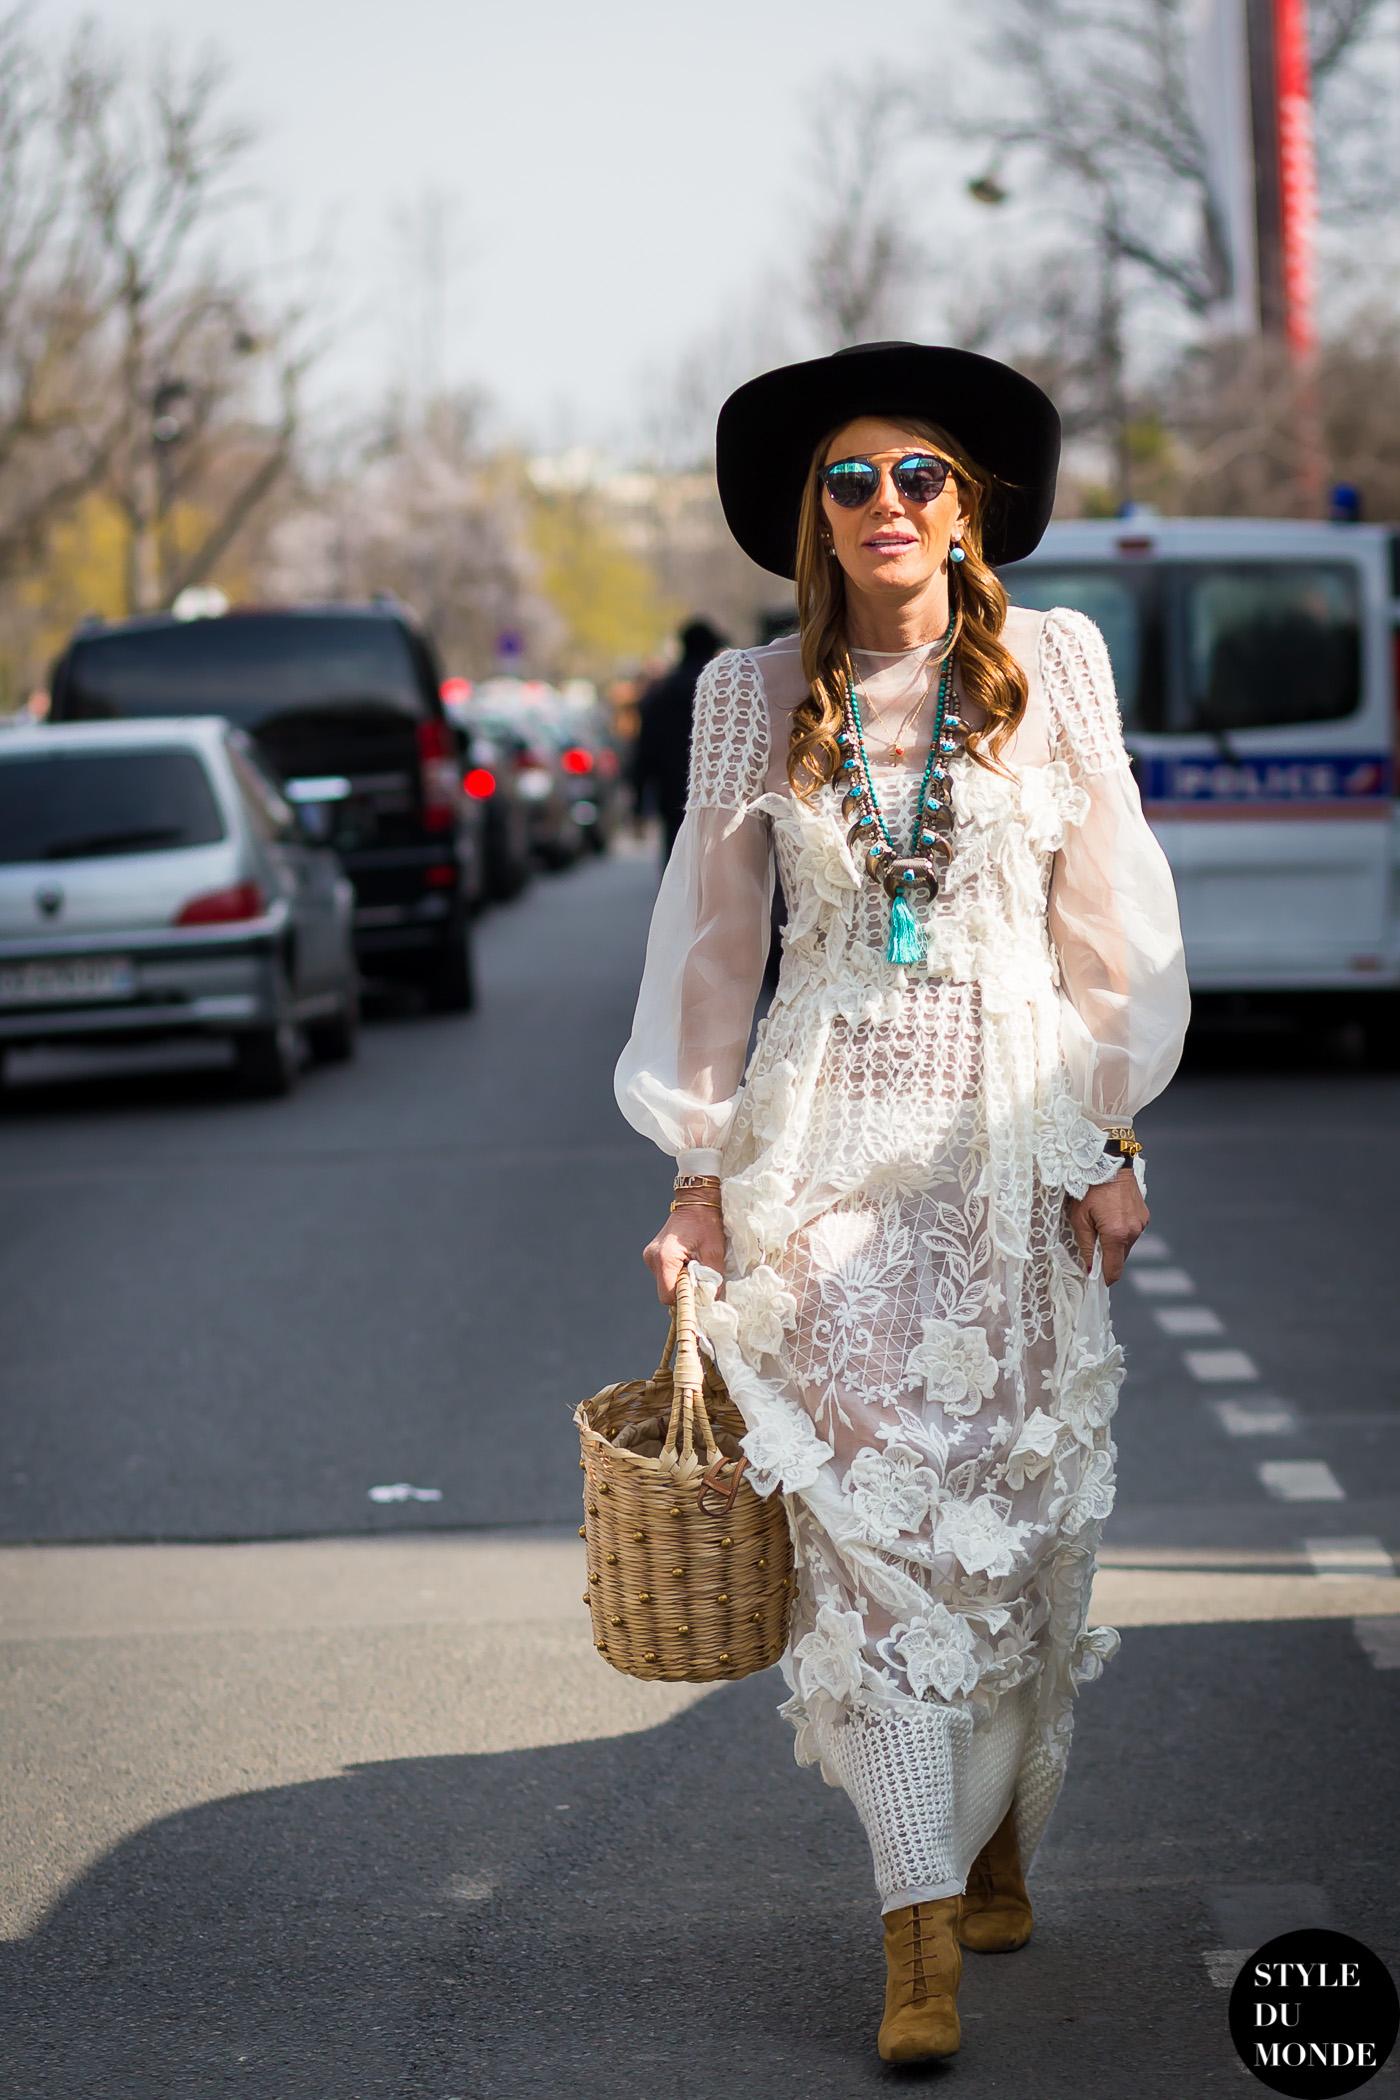 Paris Fashion Week Fw 2015 Street Style Anna Dello Russo Style Du Monde Street Style Street